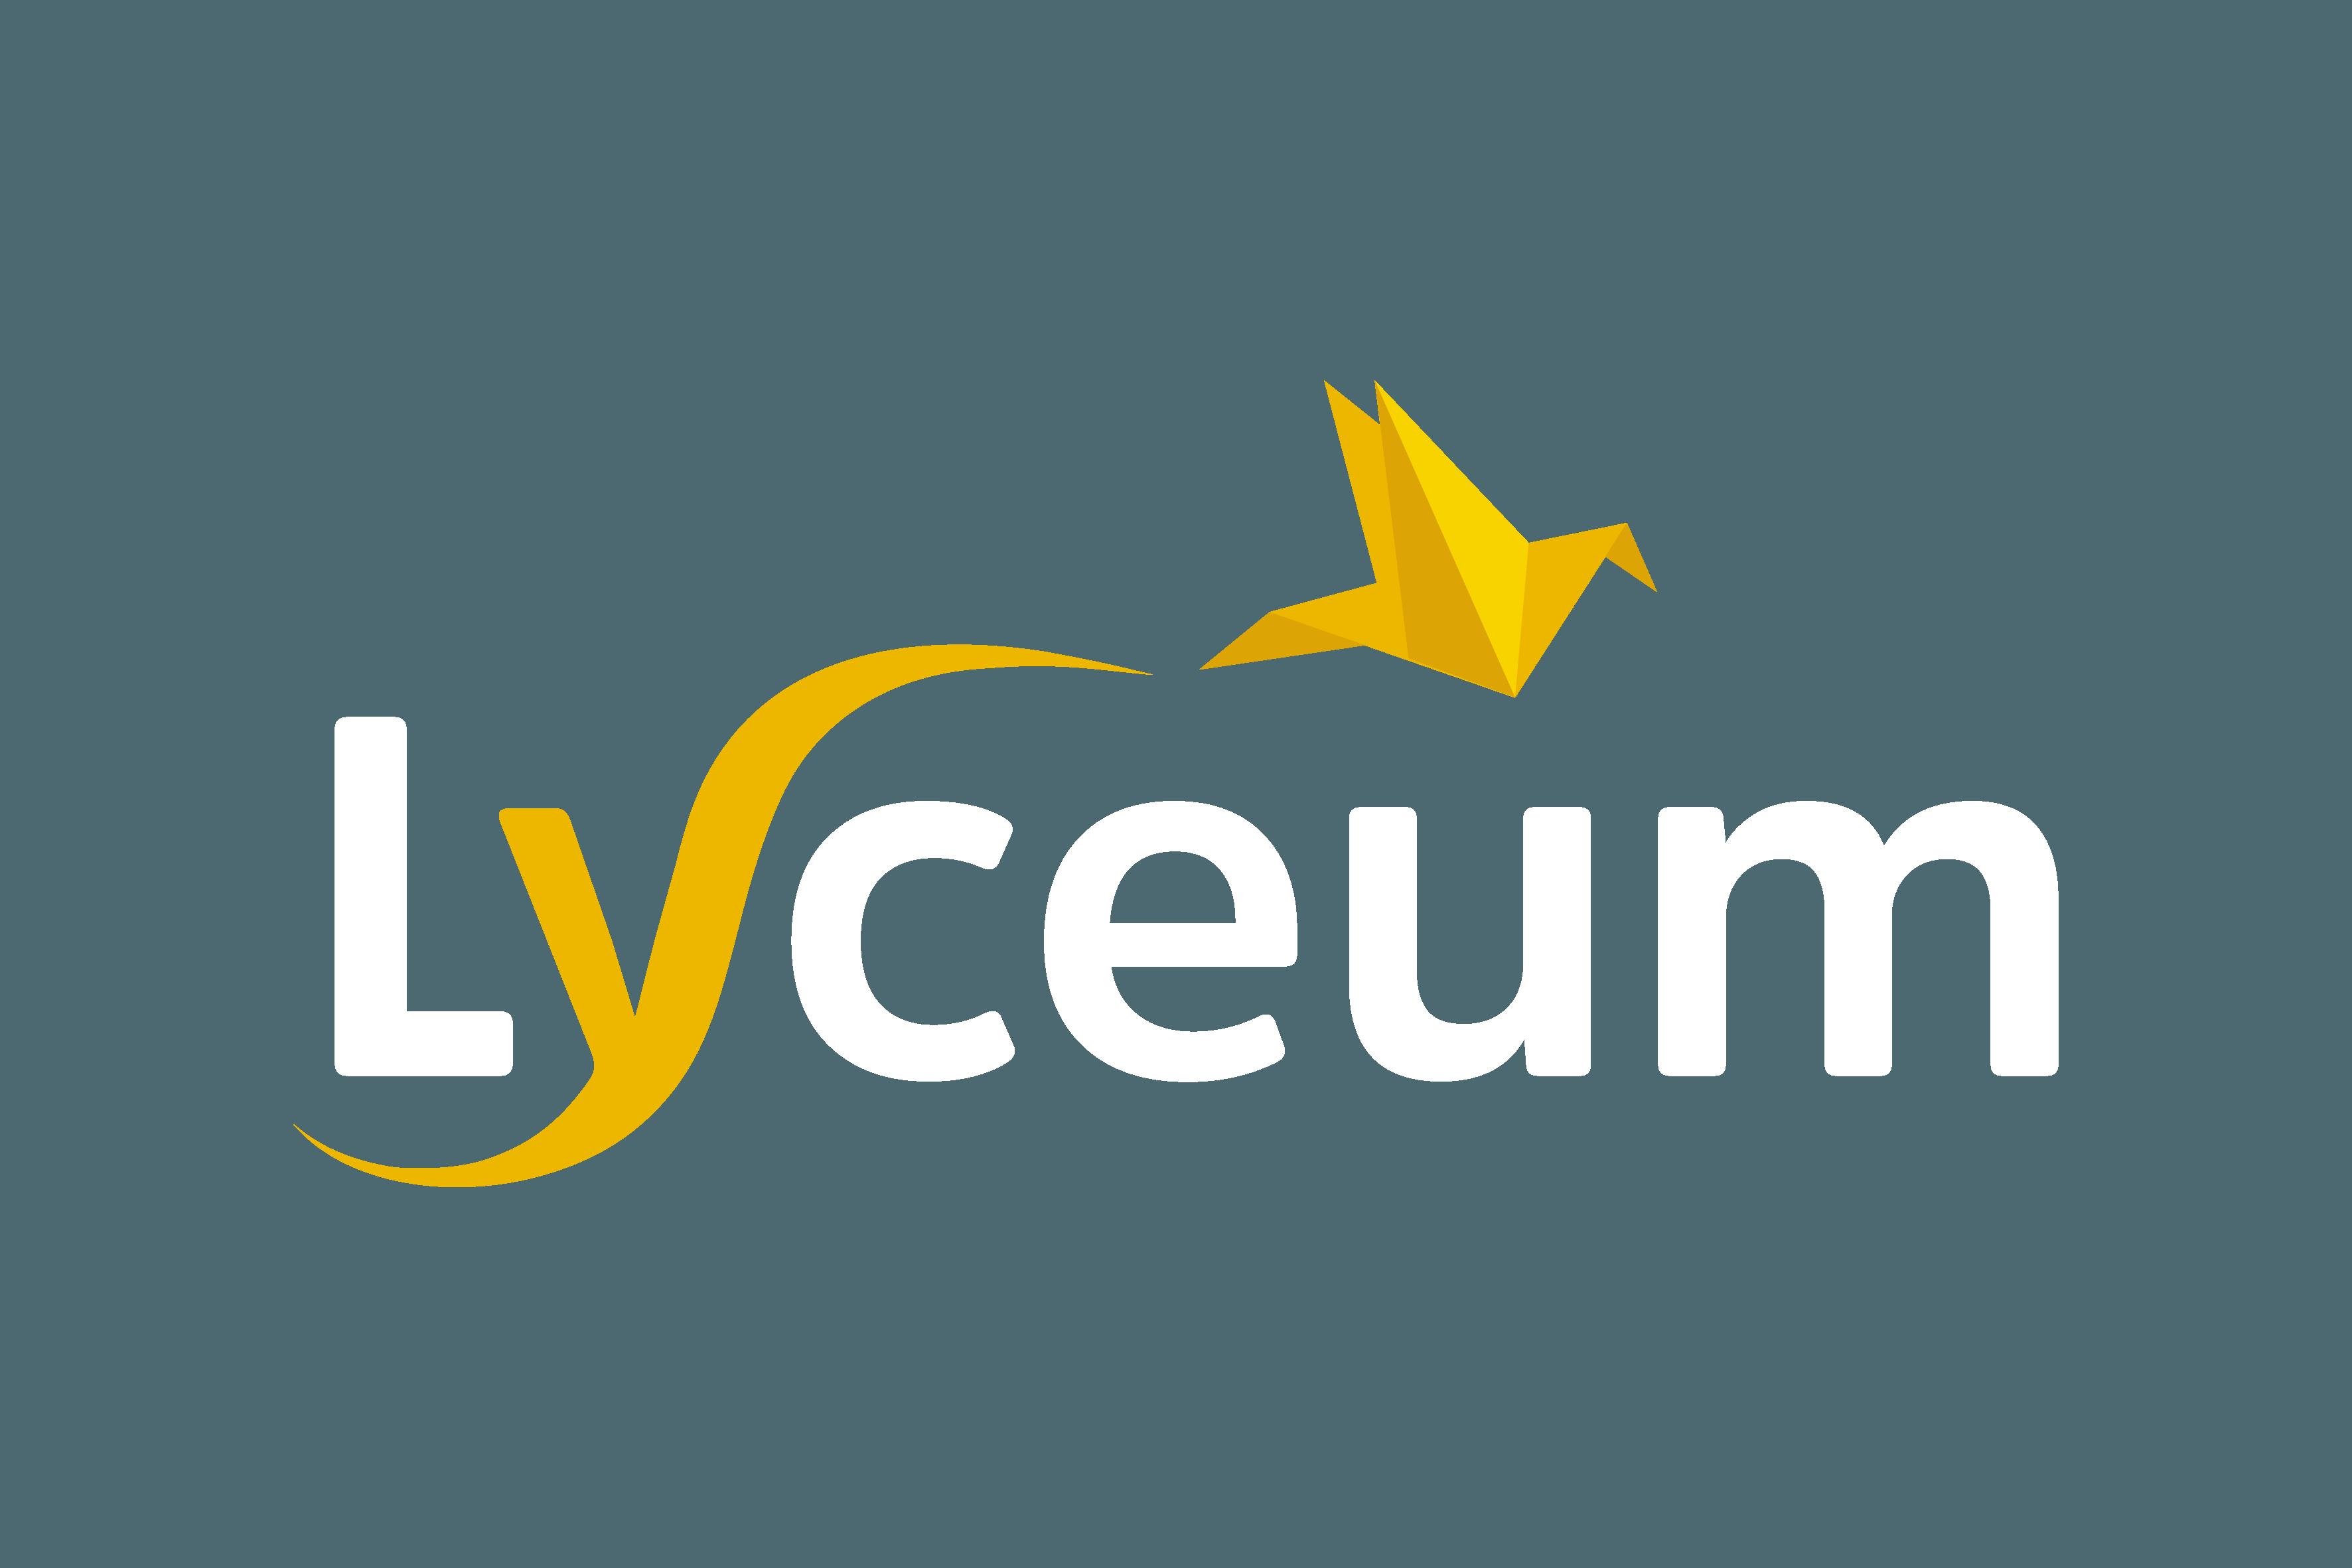 logo lyceum